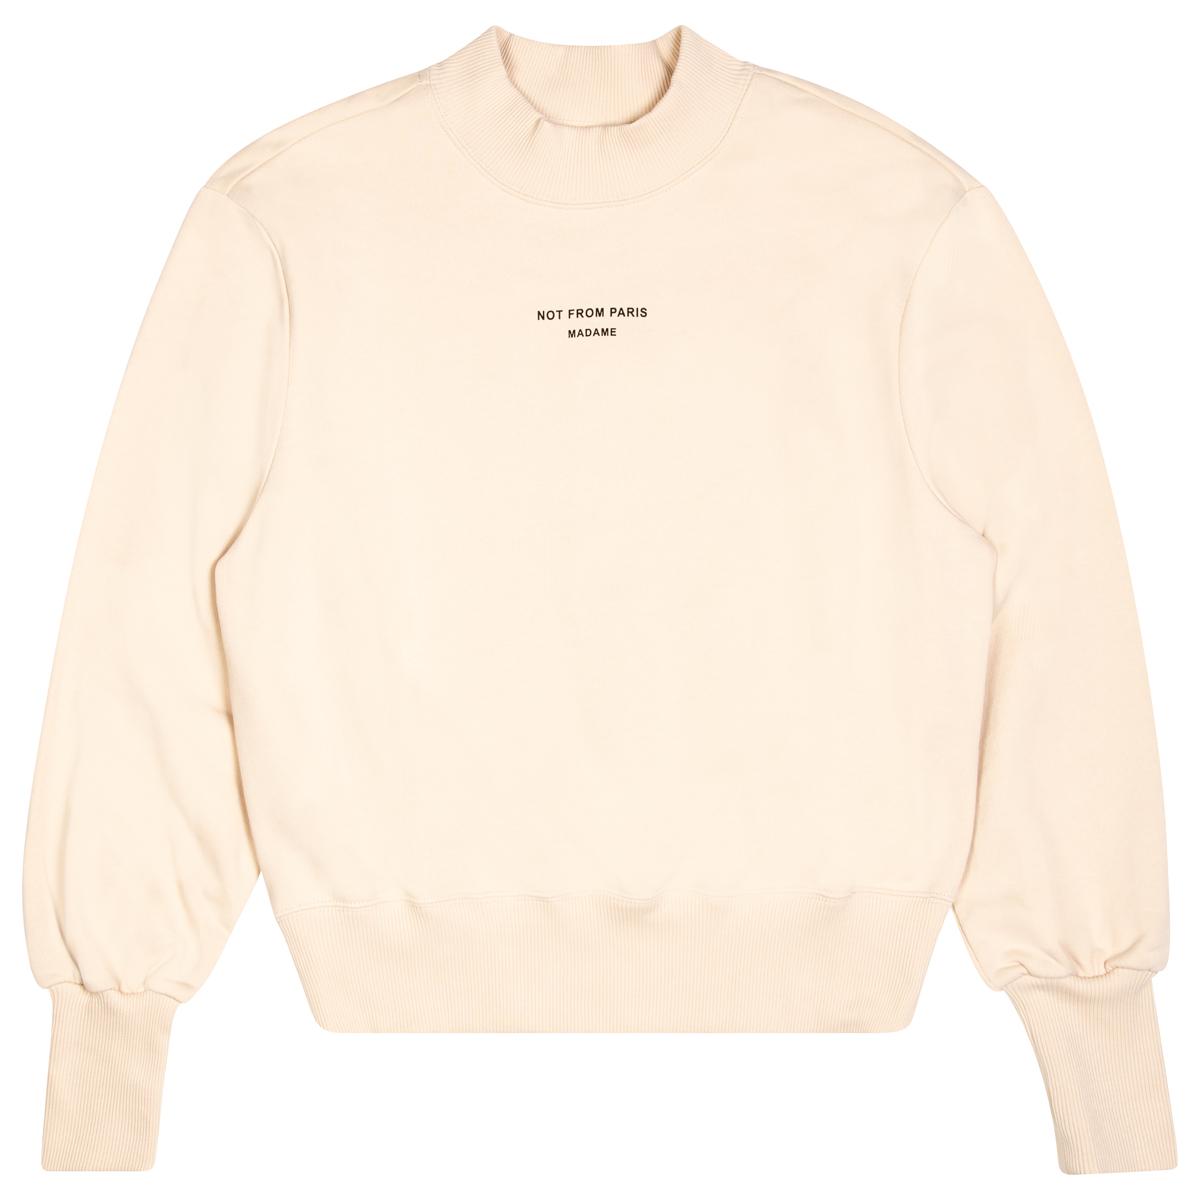 Drole De Moniseur Cropped Sweater